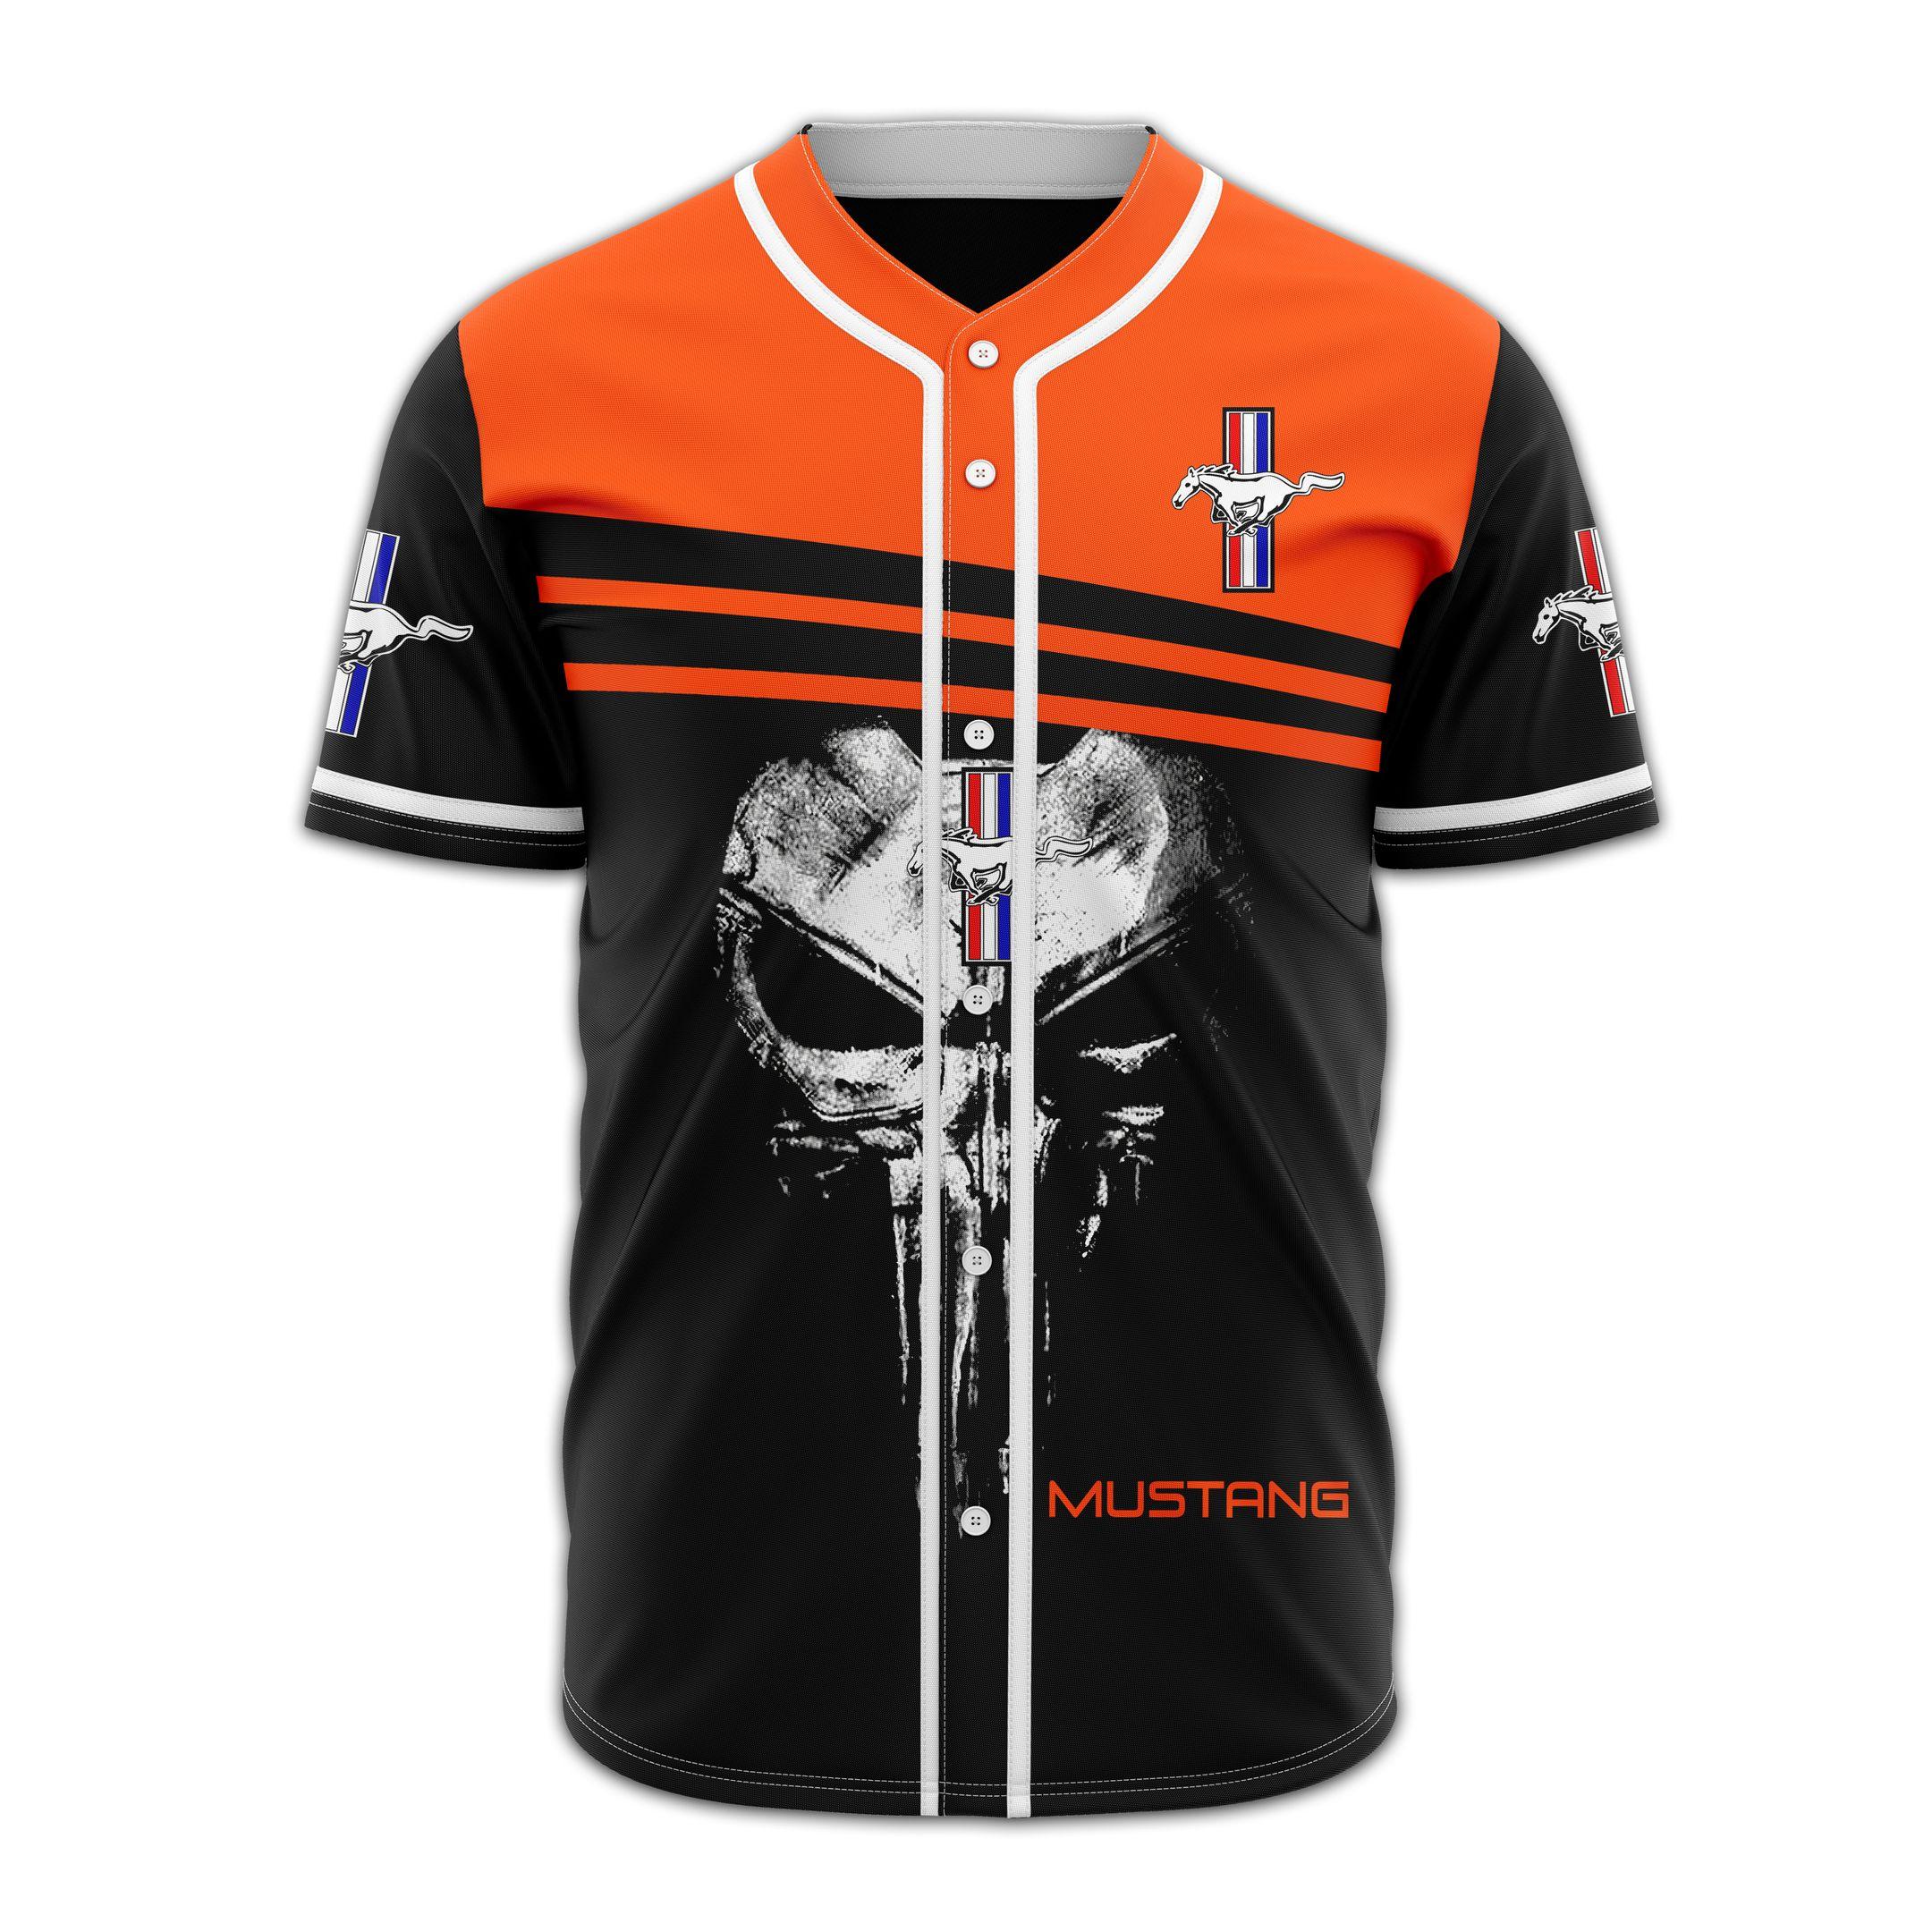 Mustang skull red and orange Baseball Jersey